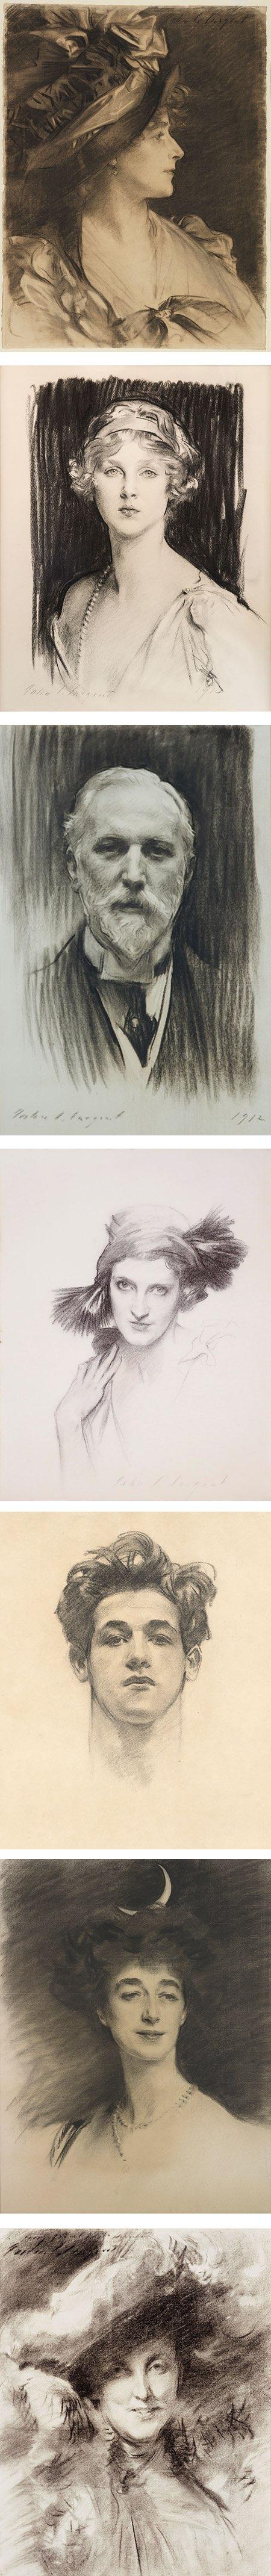 John Singer Sargent charcoal portrait drawings